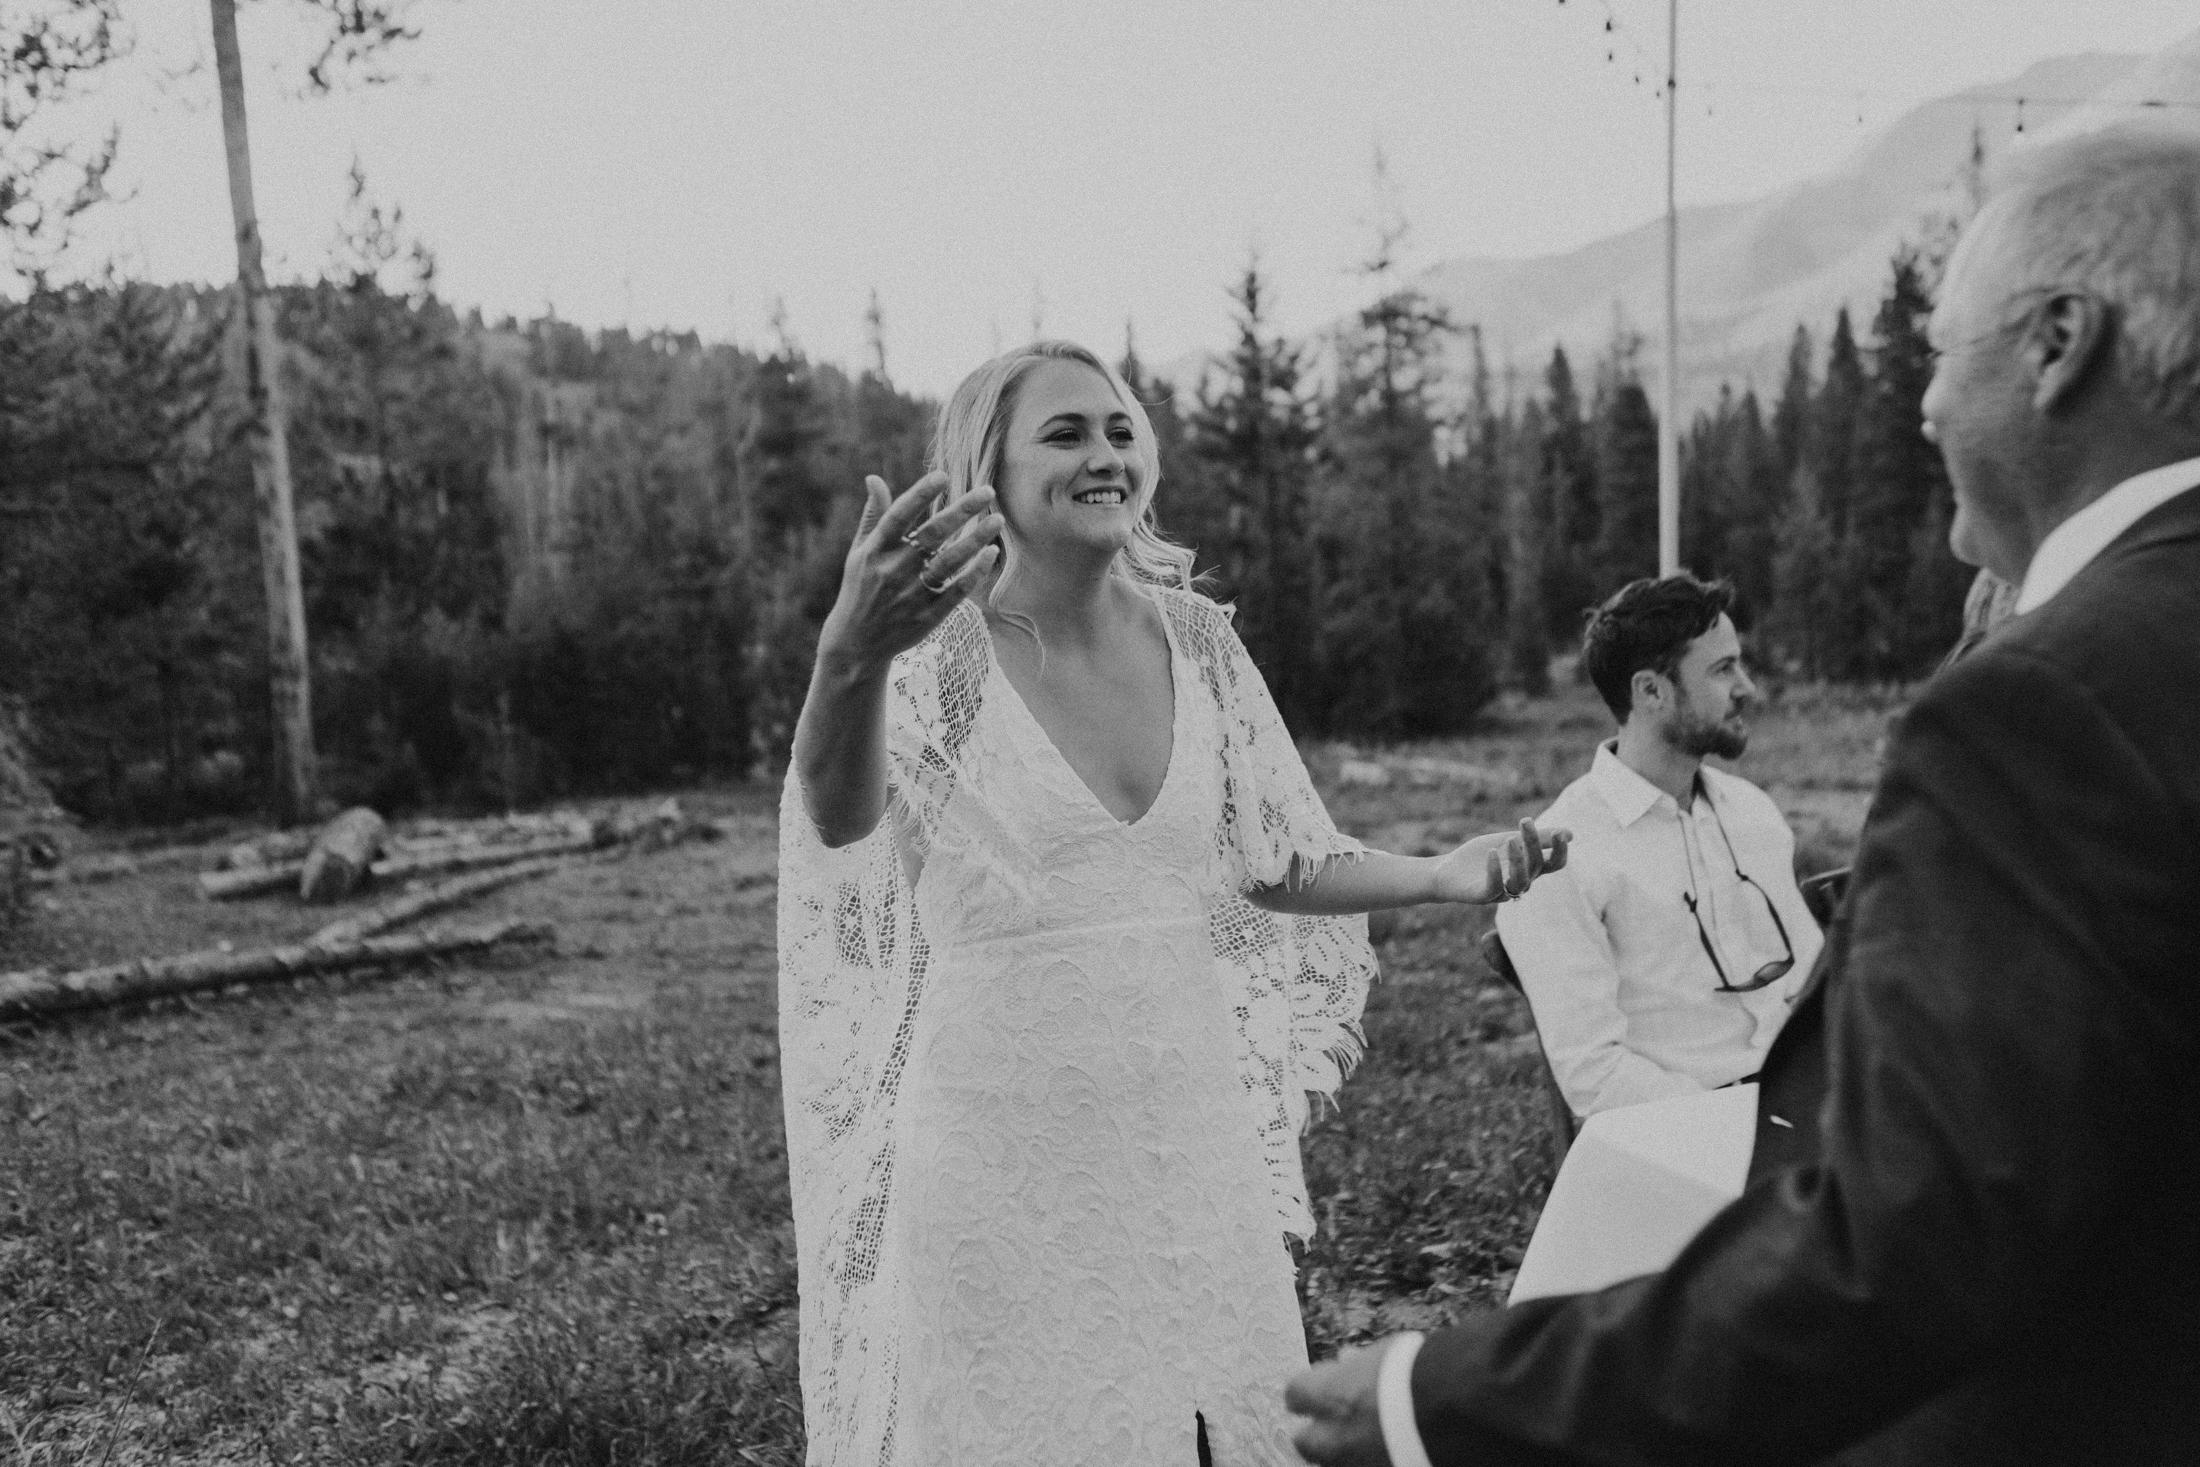 idaho-4h-camp-wedding-christinemarie-185.jpg